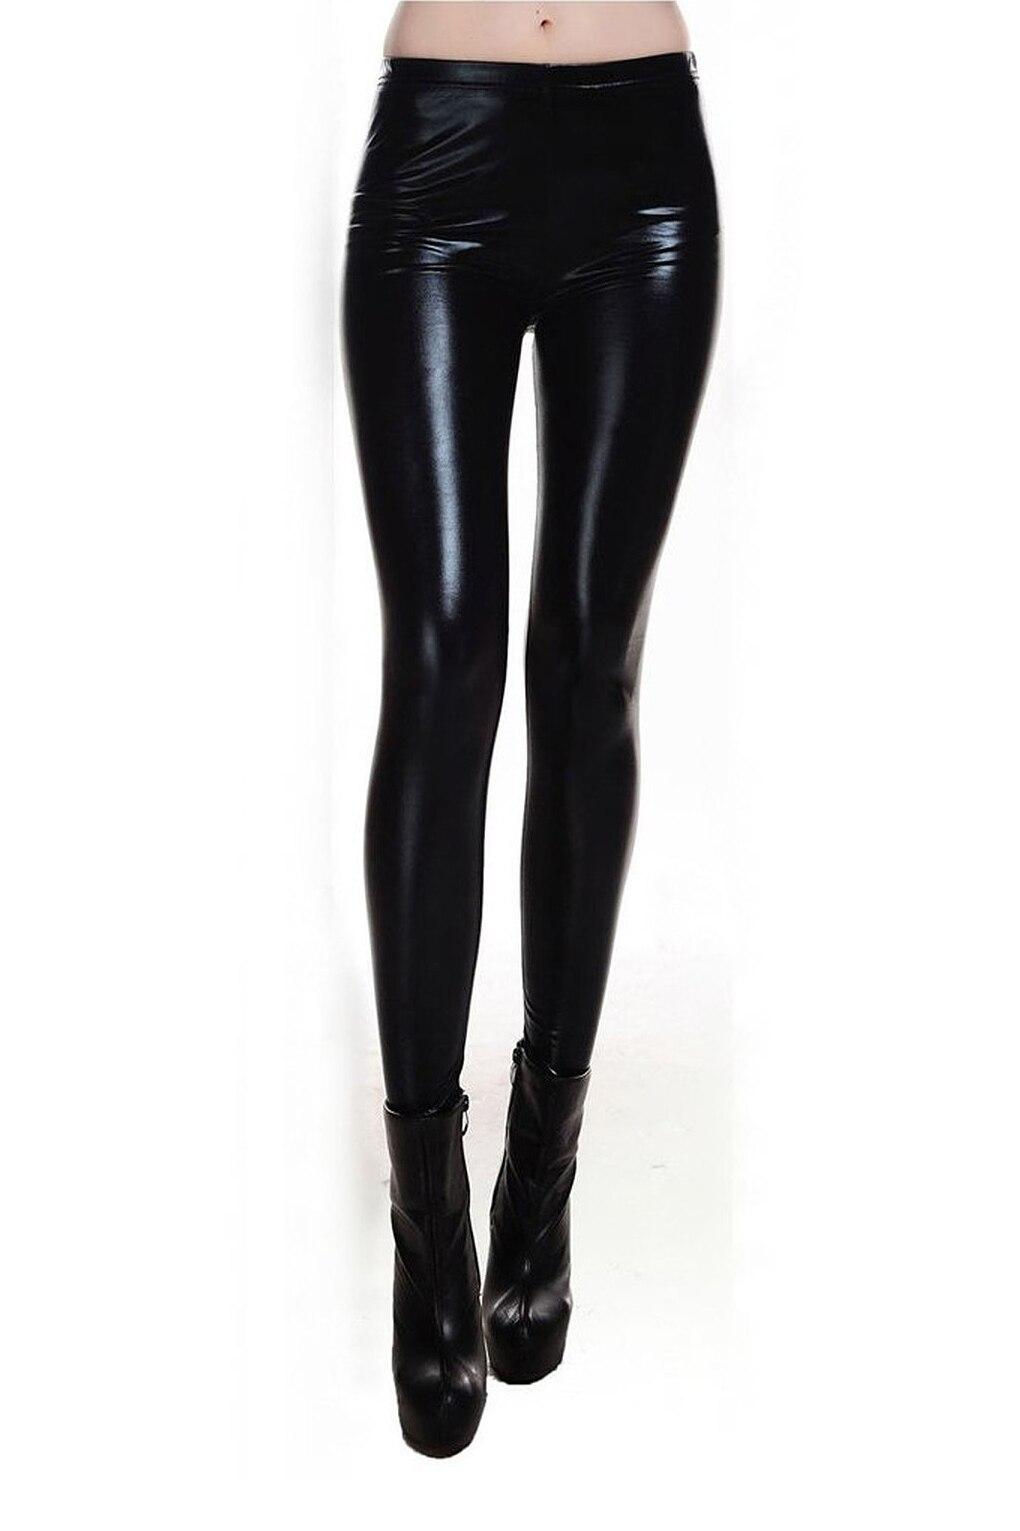 Metallic Wet Look Liquid Leggings Shiny Stretch Women Pencil Pants(black)